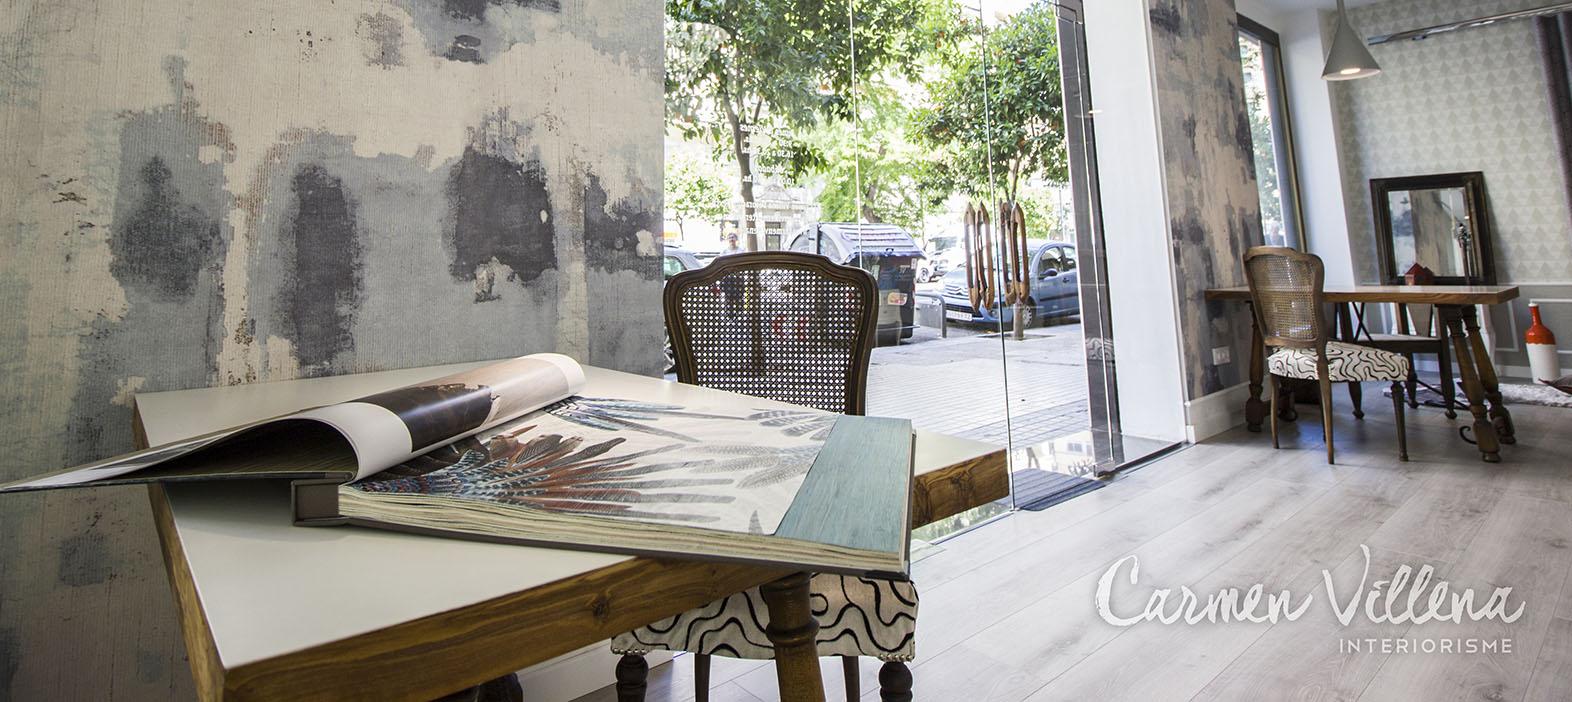 Tiendas de papel pintado en valencia fotomurales valencia - Papeles pintados en sevilla ...